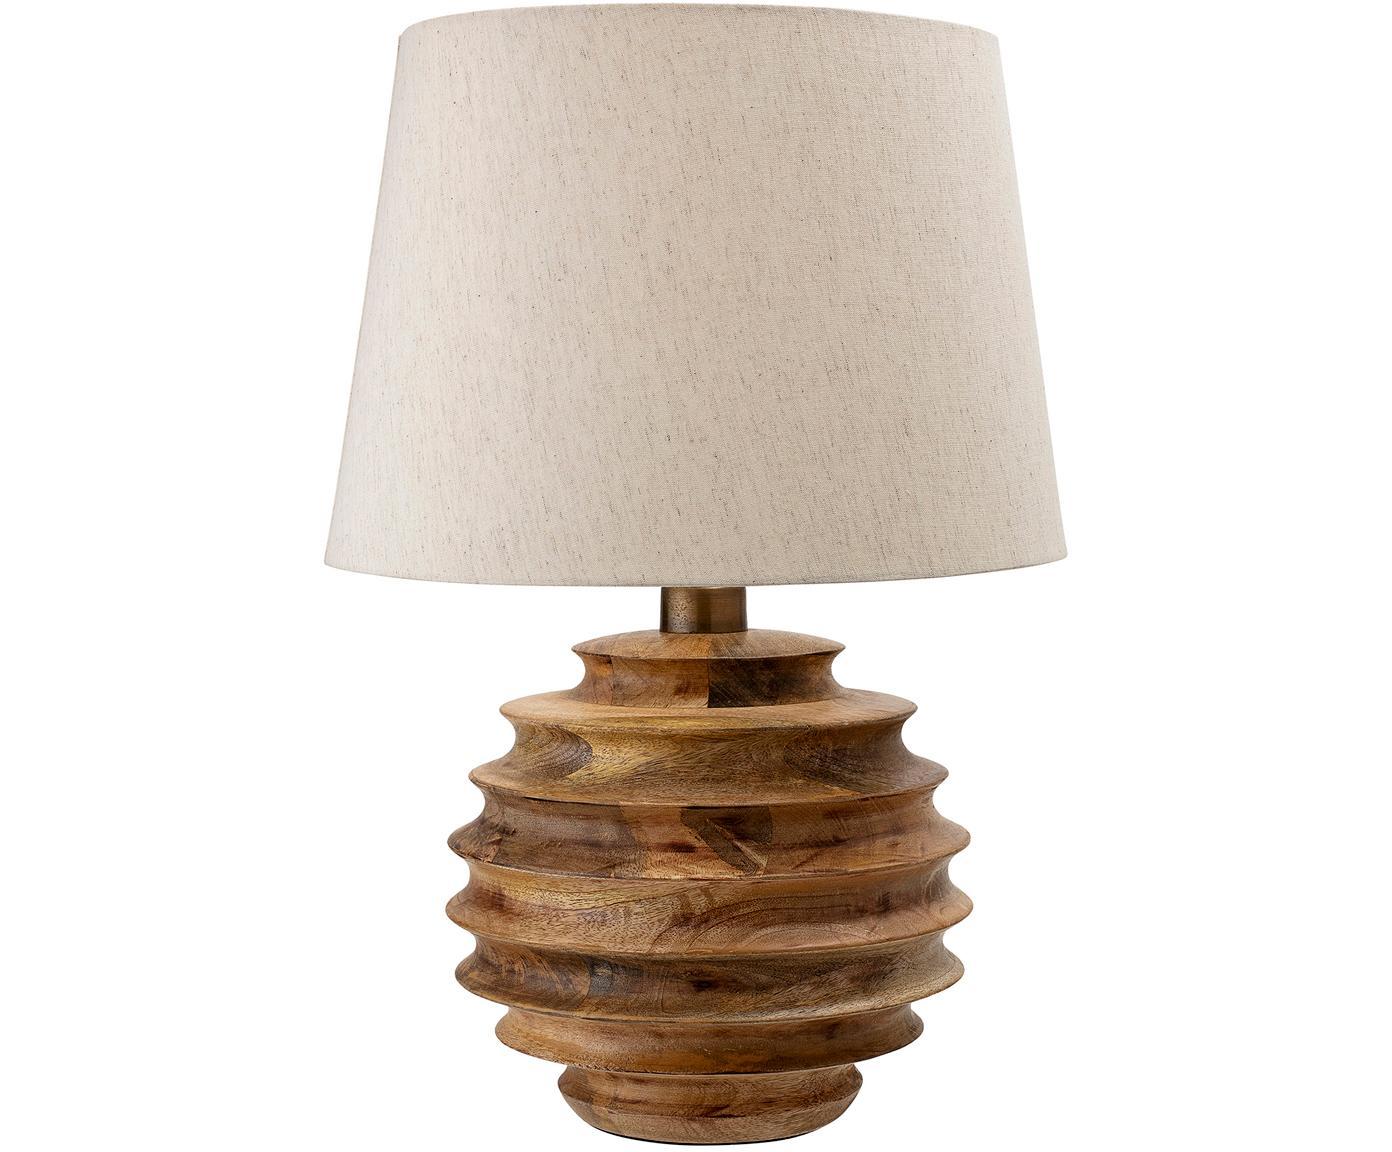 Tafellamp Forsythia, Lampvoet: mangohout, Lampenkap: katoen, Wit, mangohoutkleurig, Ø 38 x H 54 cm